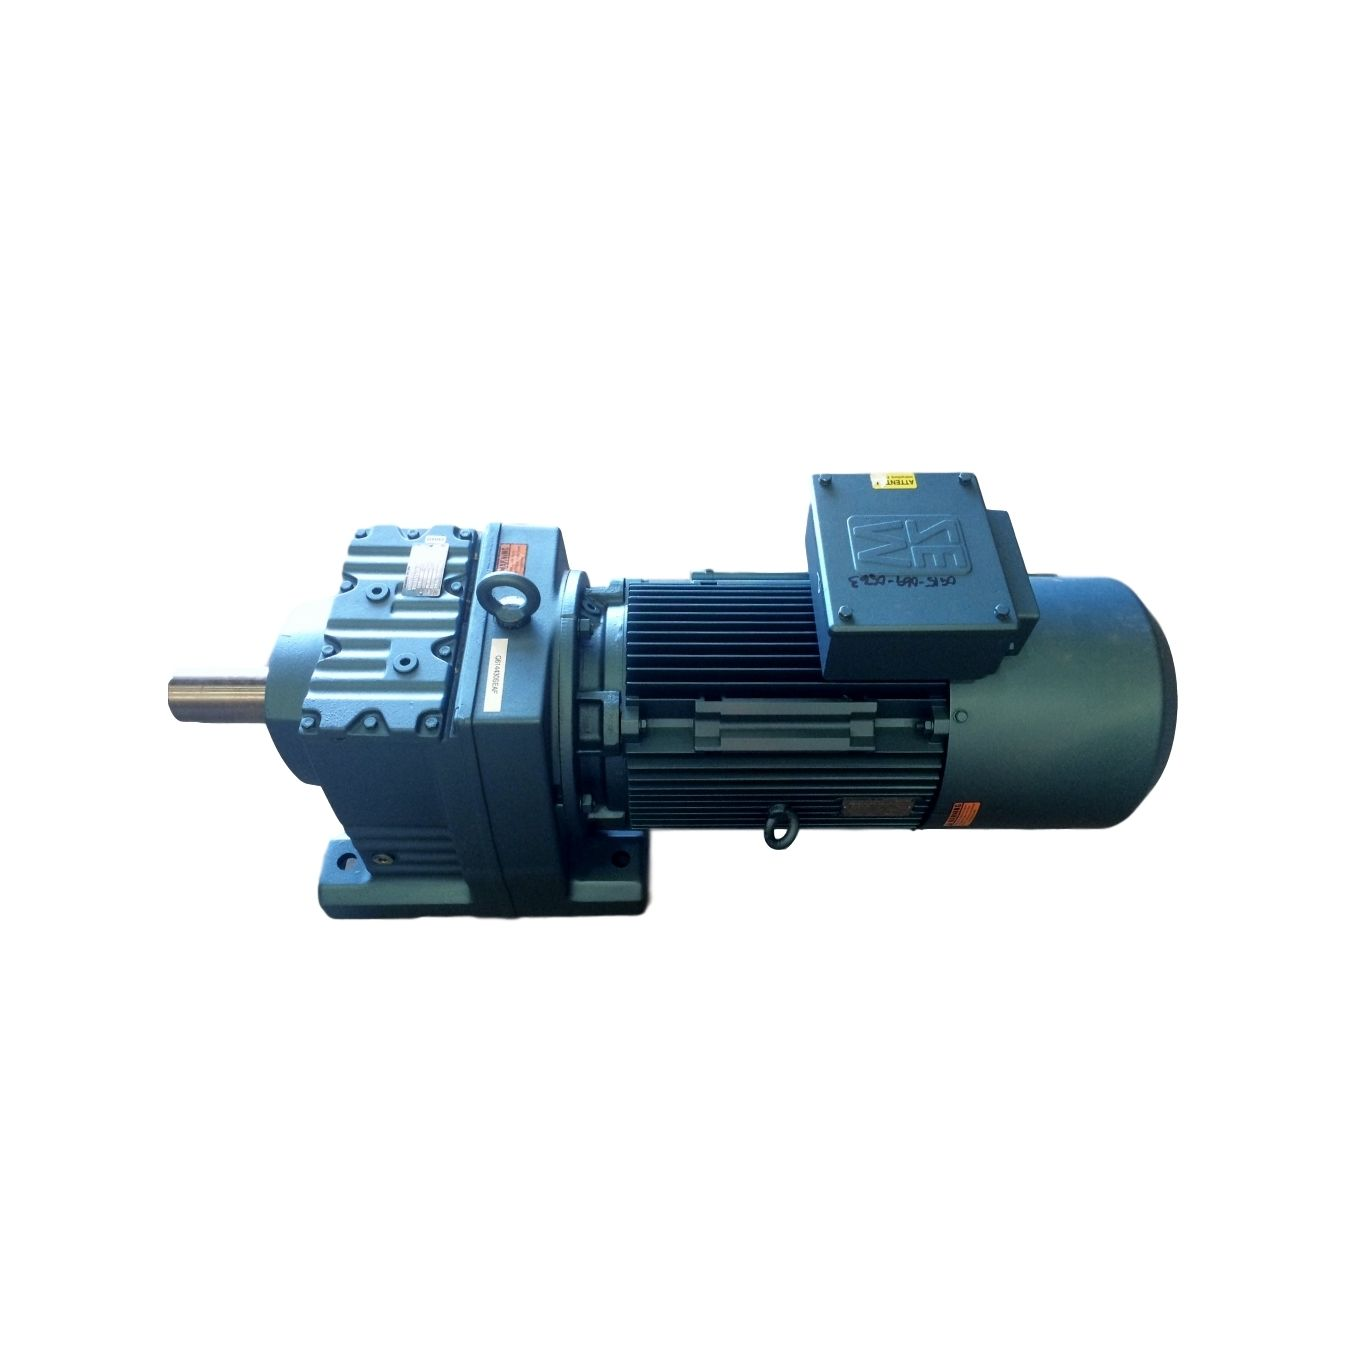 25 Hp Sew Eurodrive Gearmotor Speed Reducer Drive